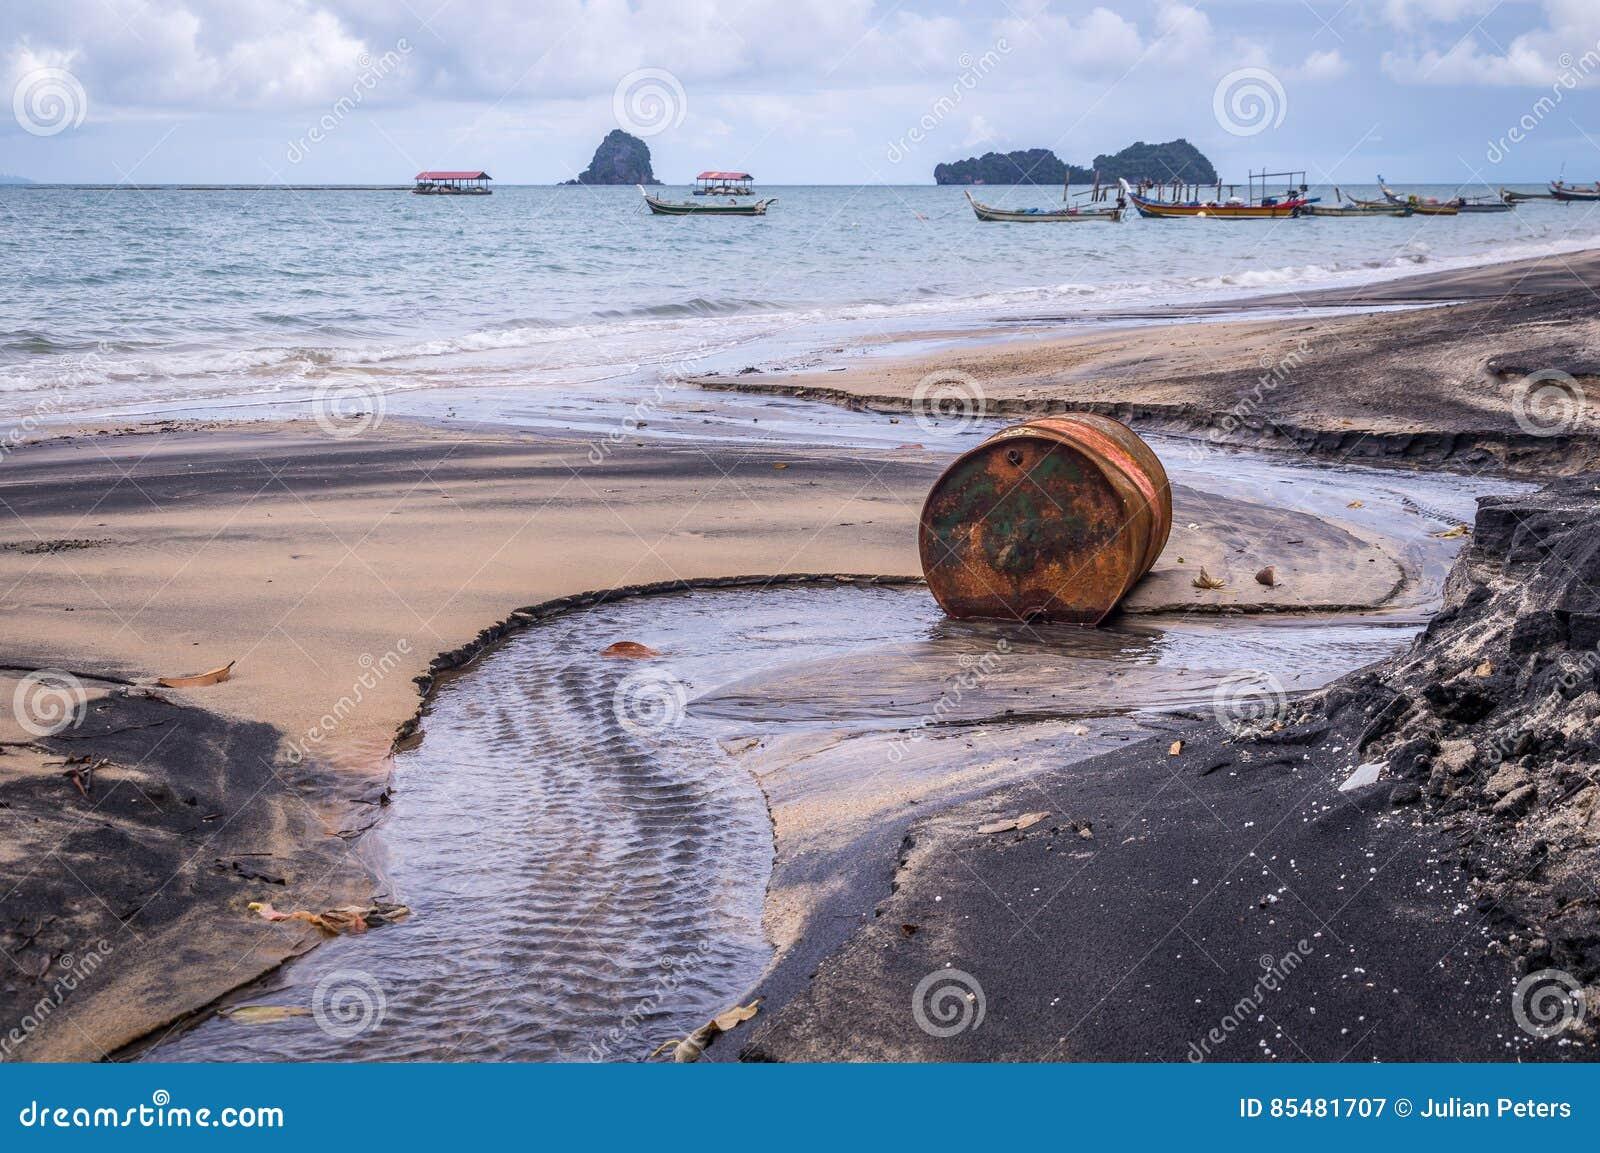 Old rusty barrel oil on beach in Asia